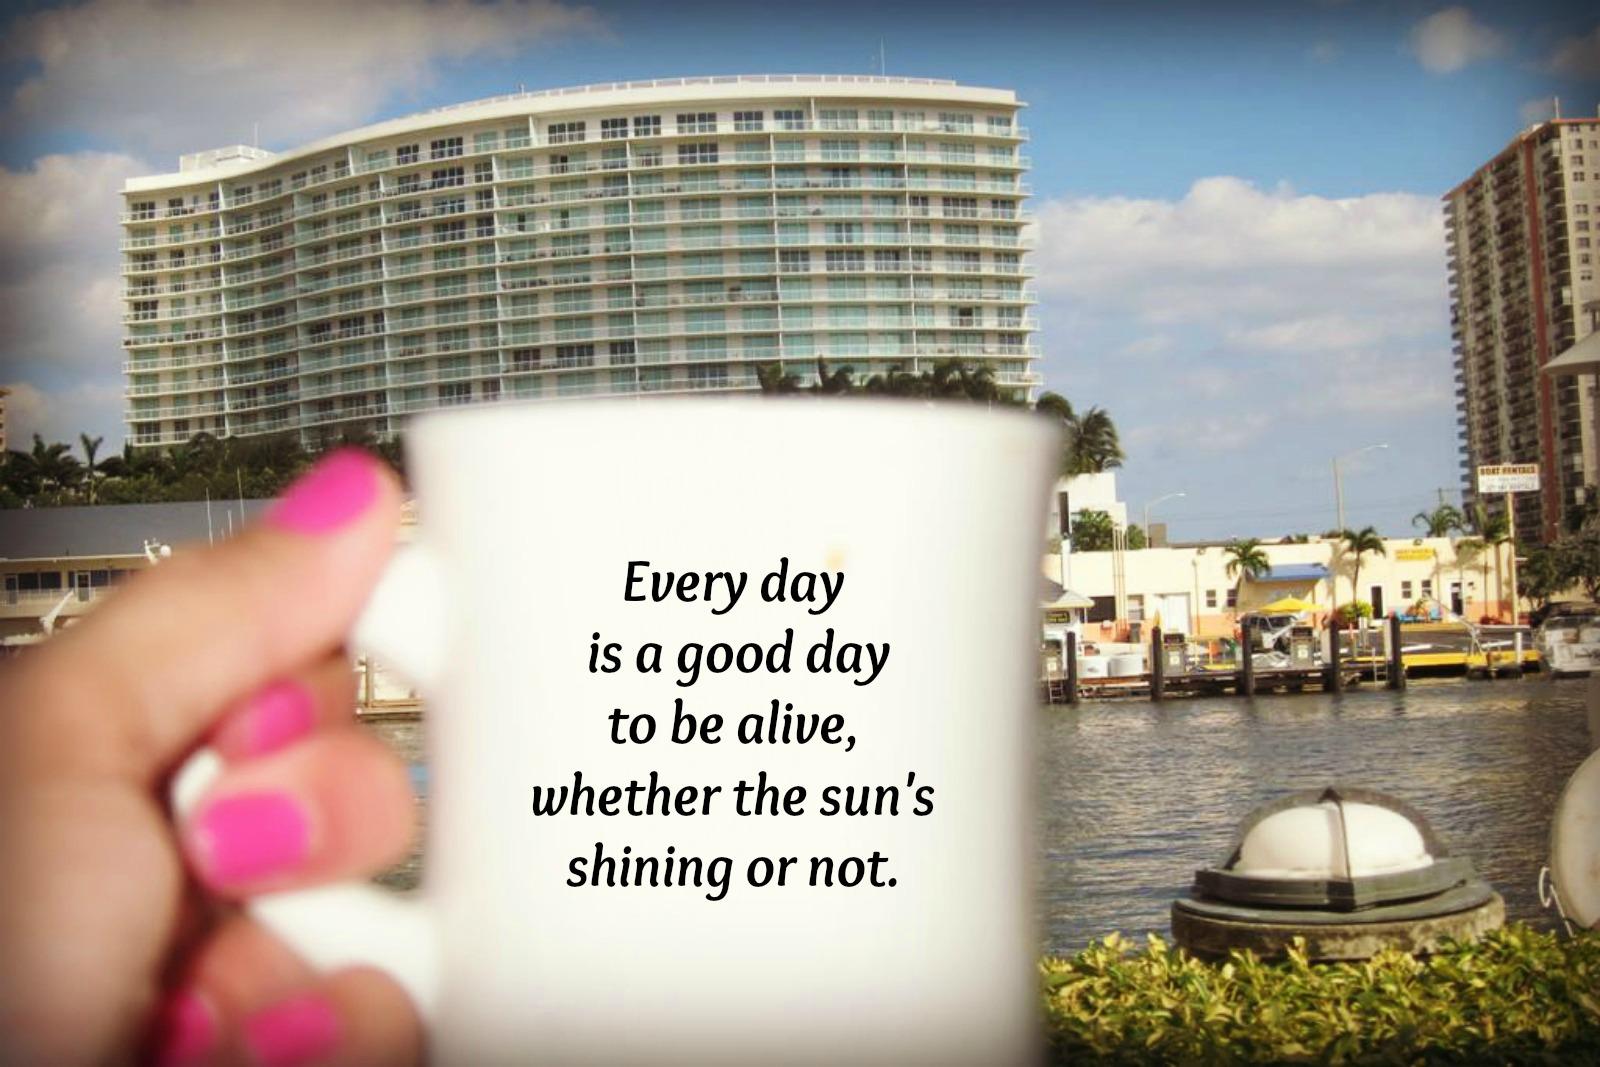 Nadiya   Loving Every Moment: Good Day